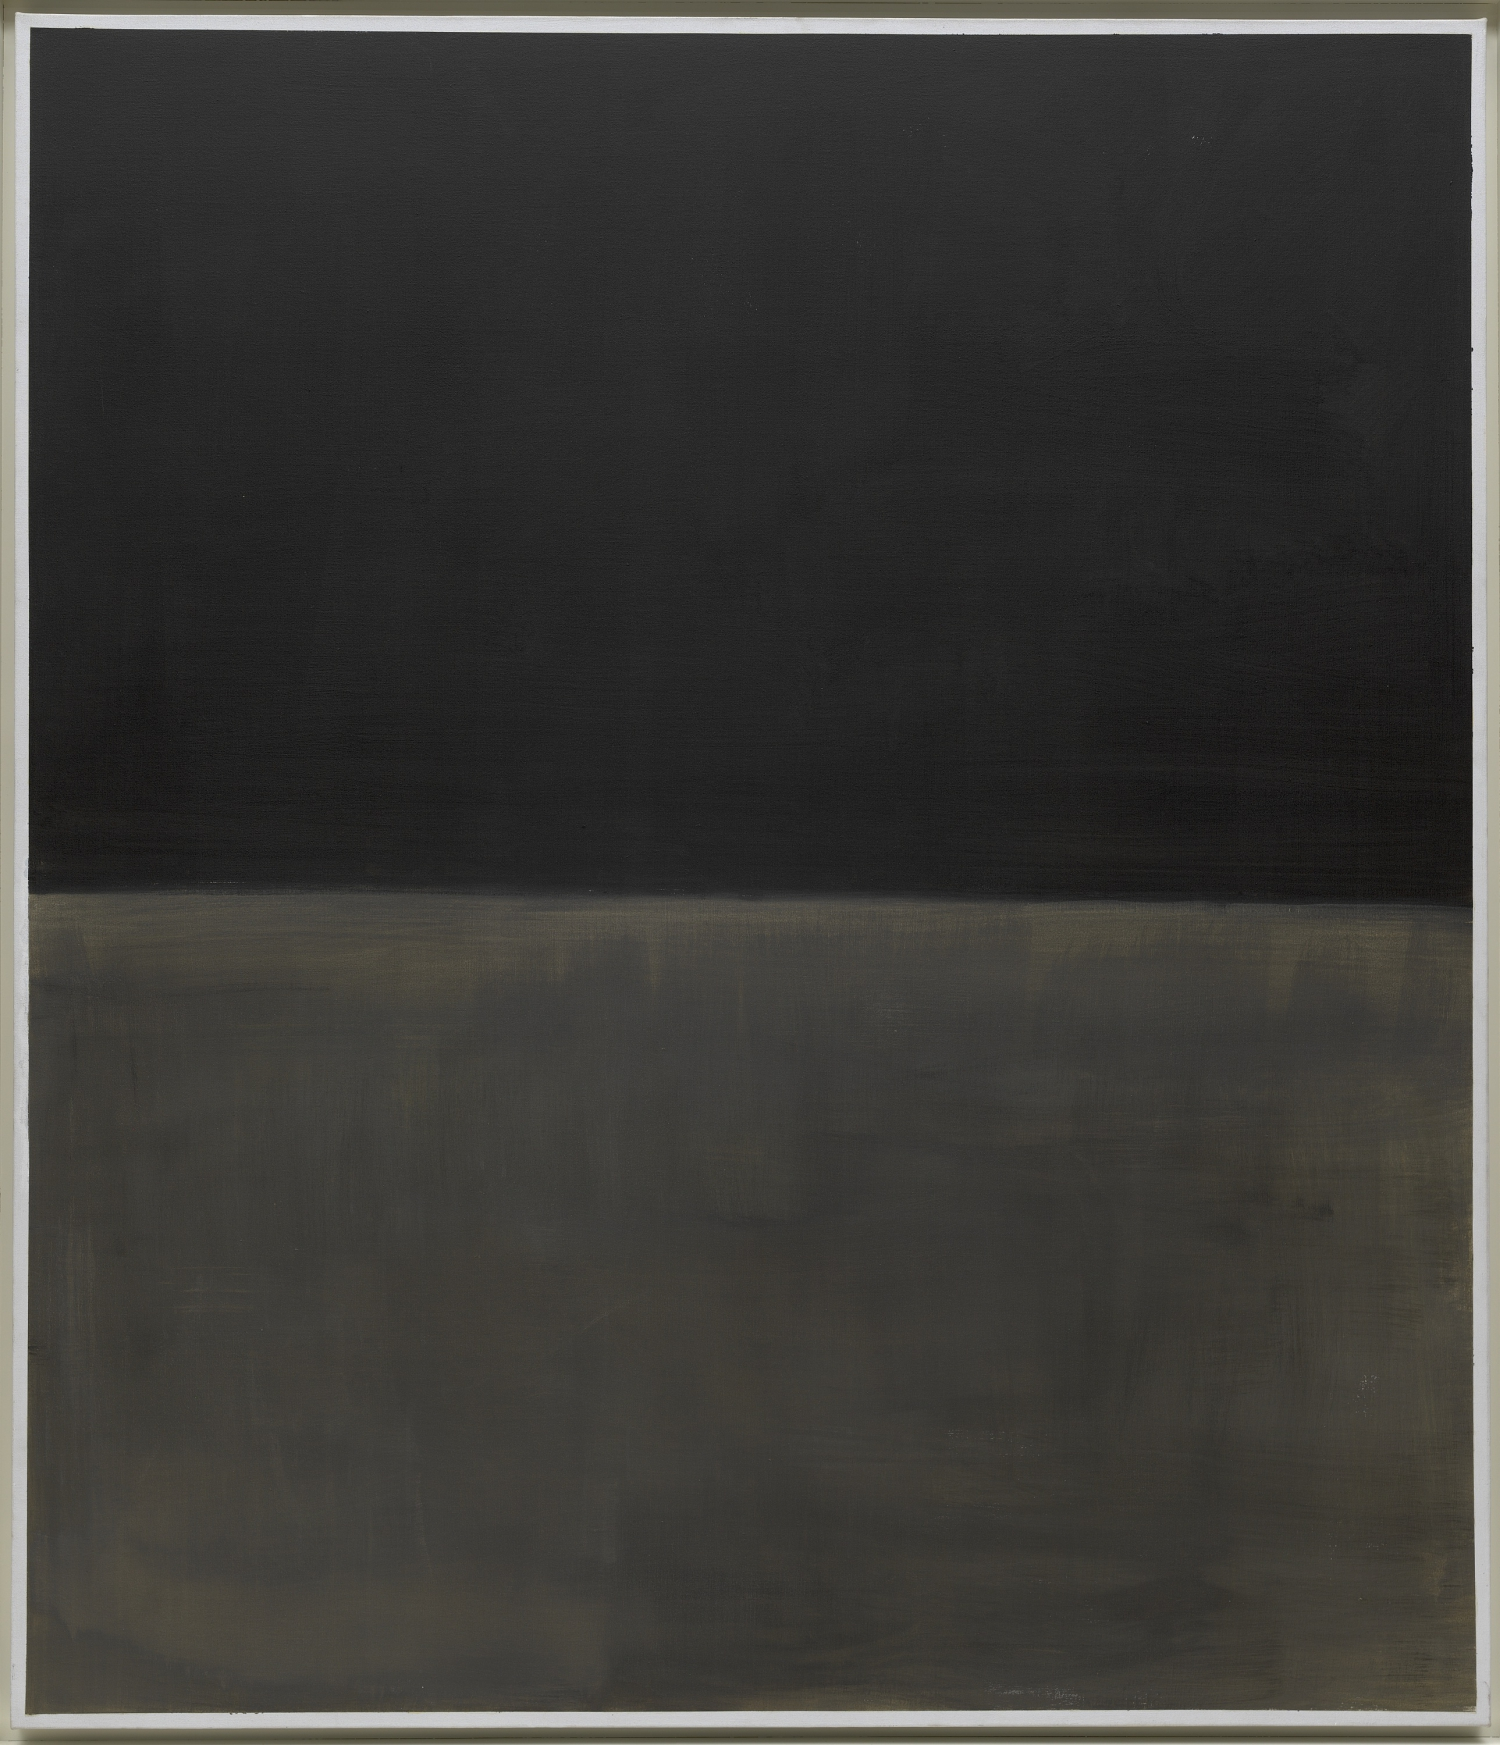 Mark Rothko (Marcus Rothkowitz; Dvinsk 1903-New York 1970) Senza titolo (Nero su grigio) 1969-1970